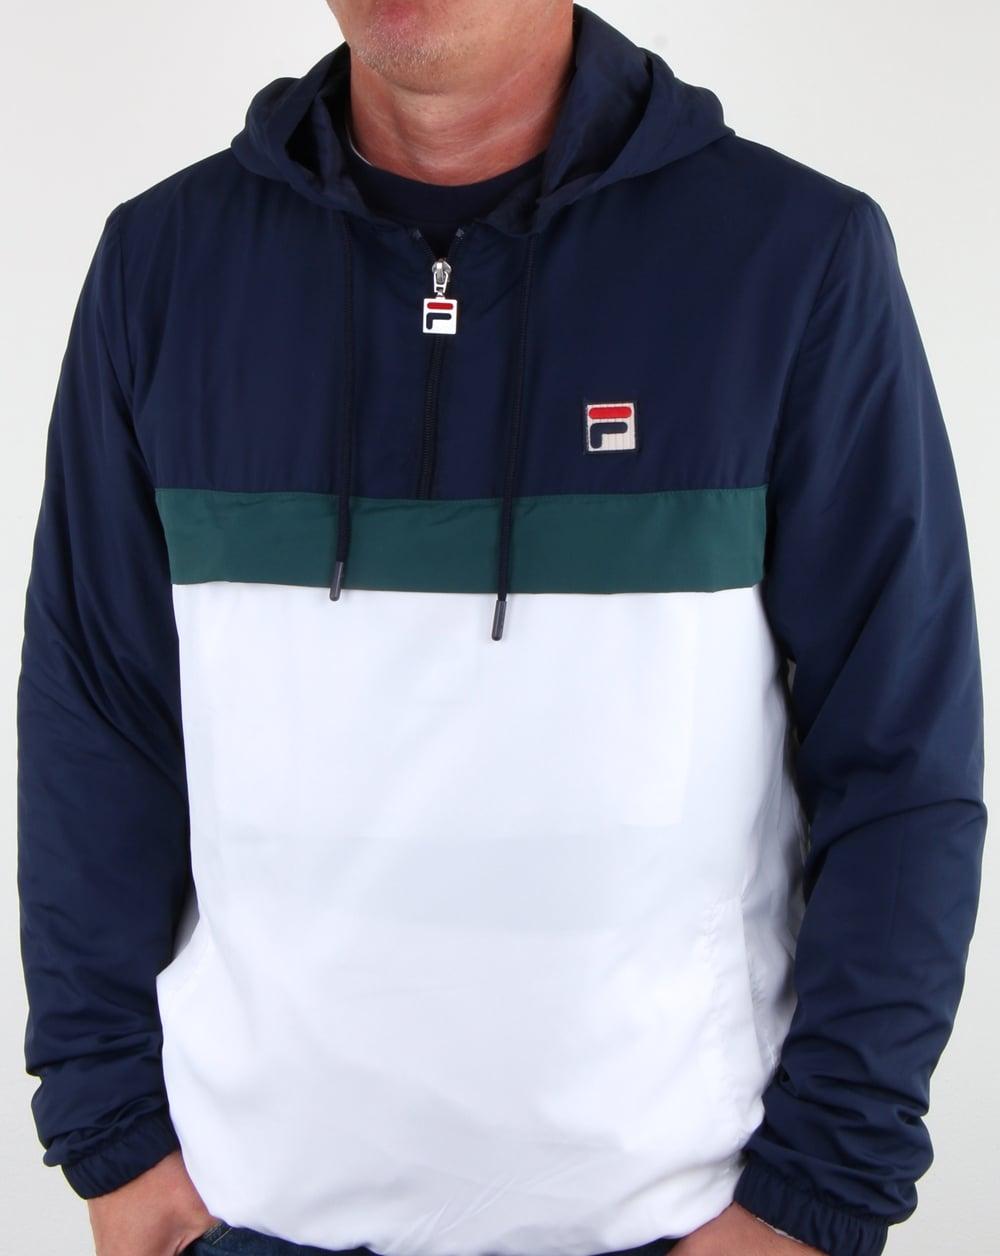 a4c6b365d531 Fila Vintage Cipolla Overhead Jacket White/navy/Green, Mens, Jacket